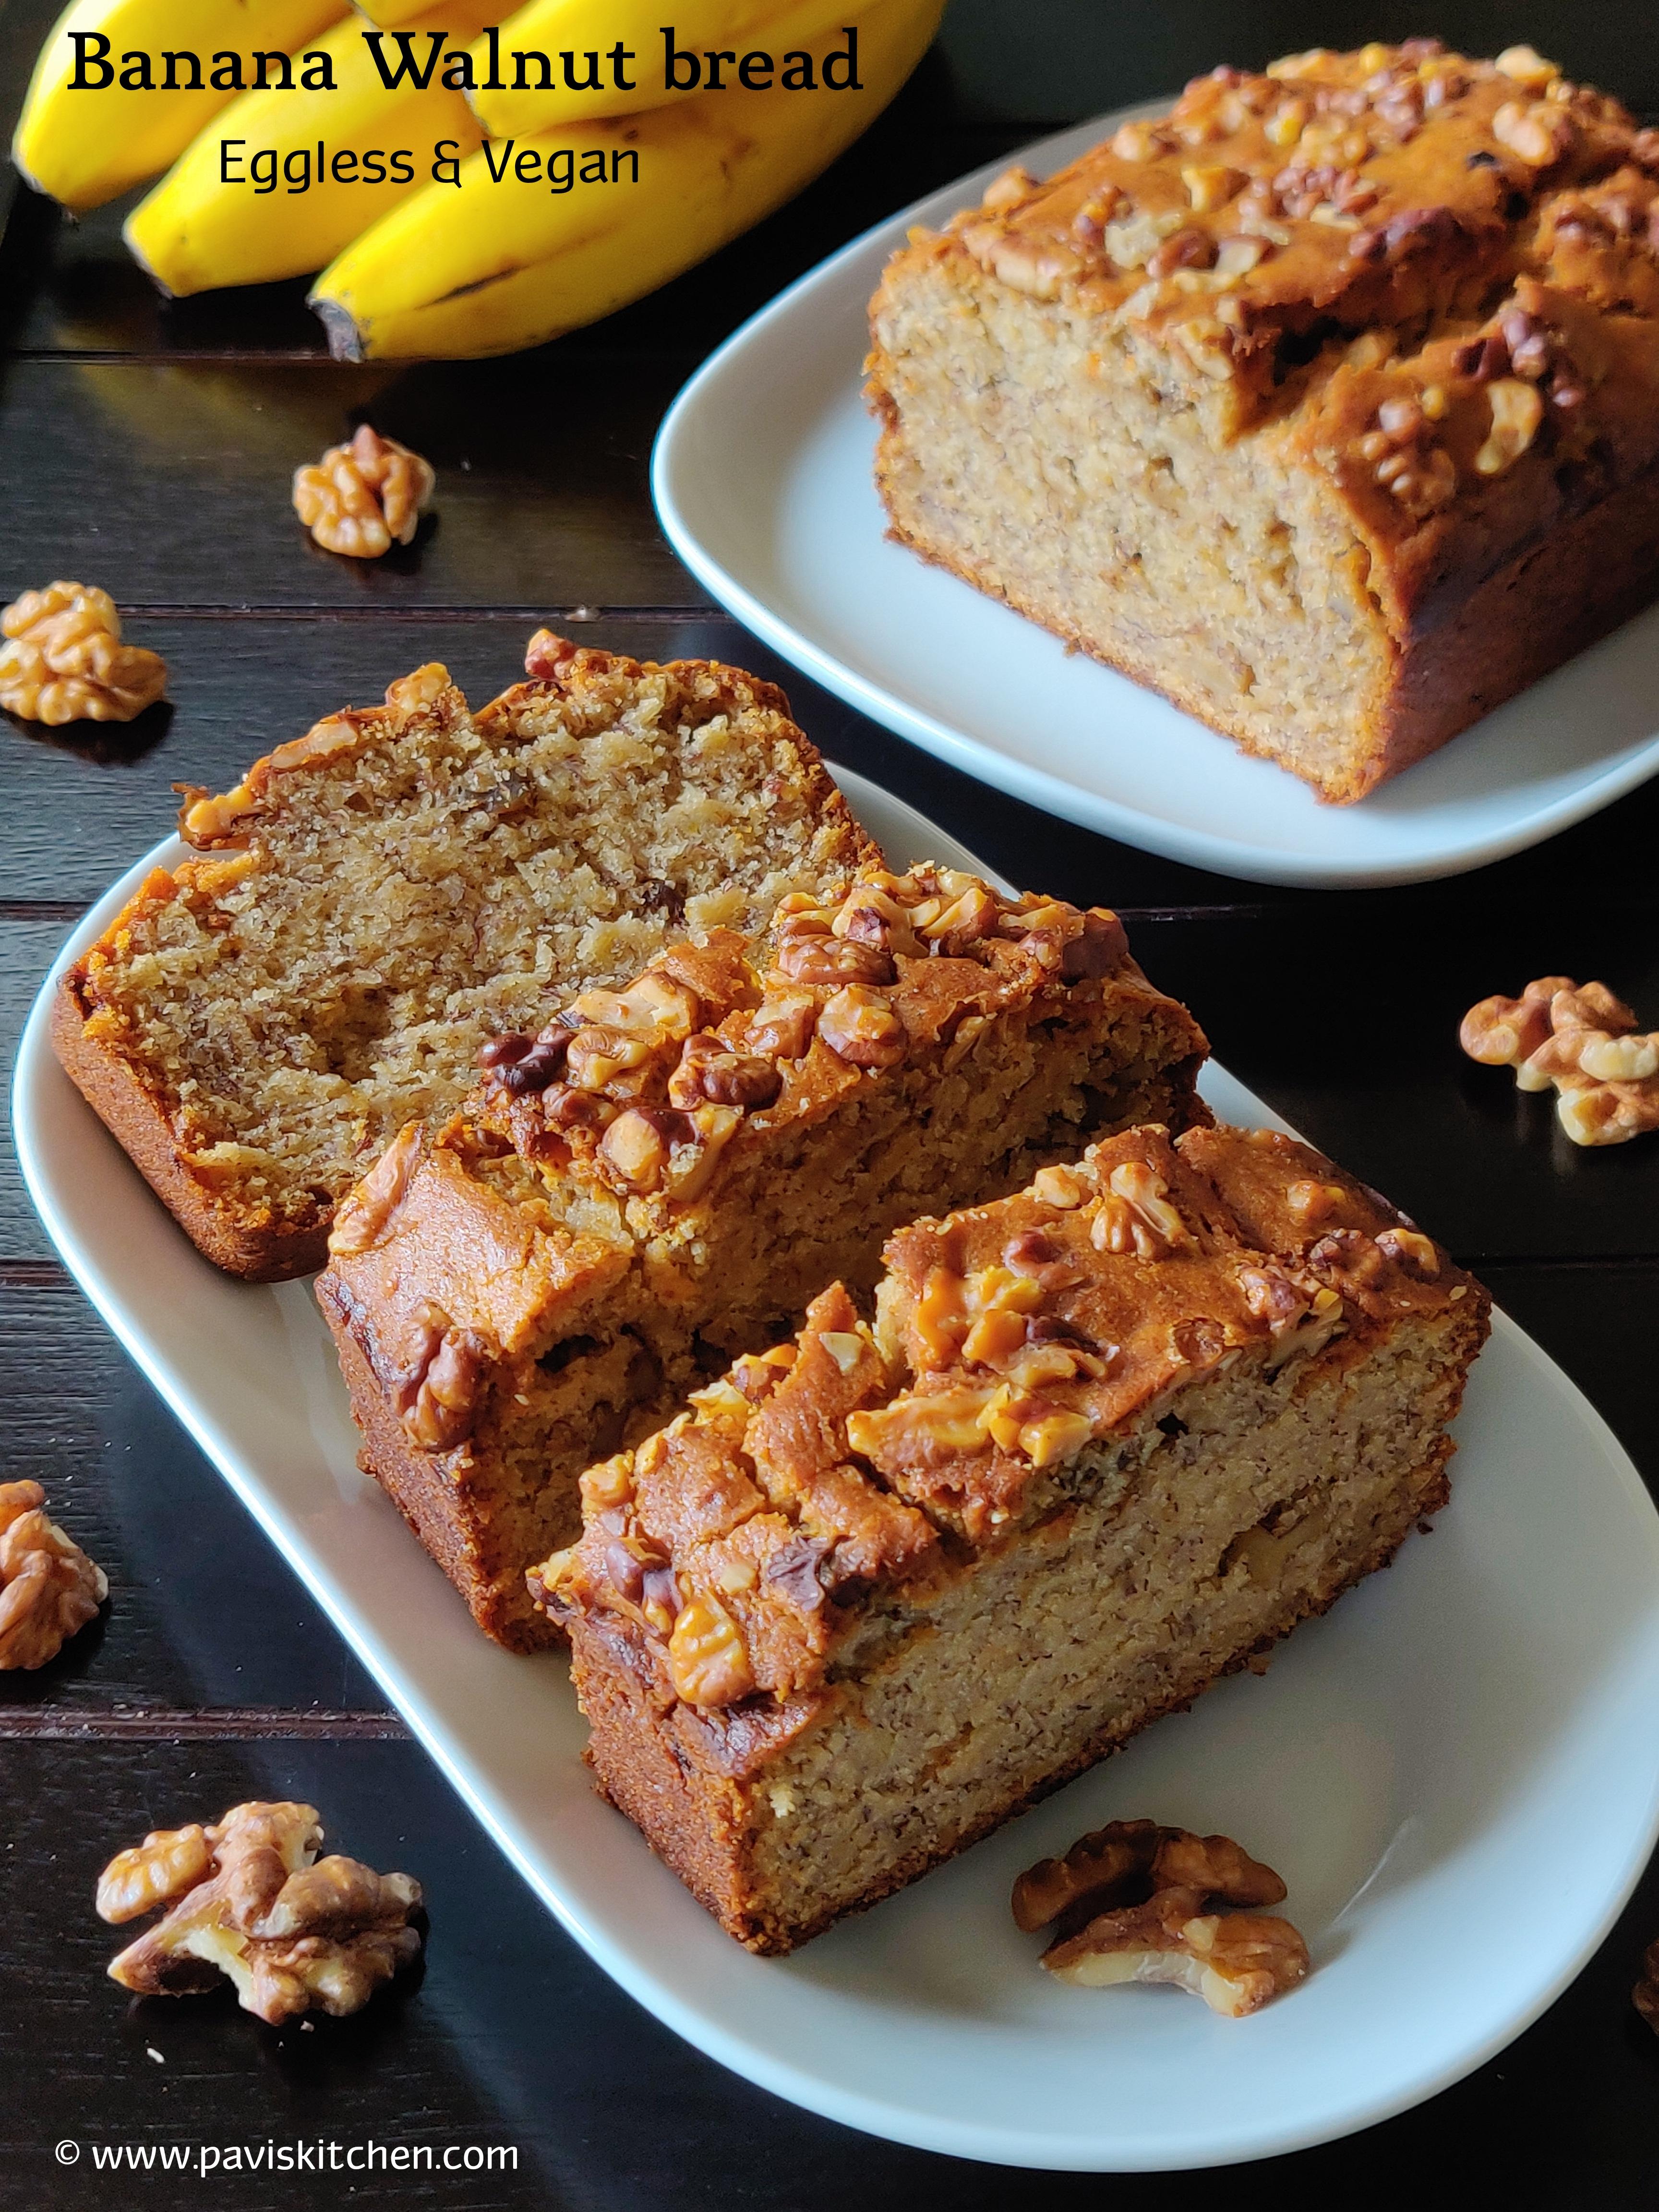 Eggless banana bread recipe | Eggless whole wheat banana bread recipe | Vegan